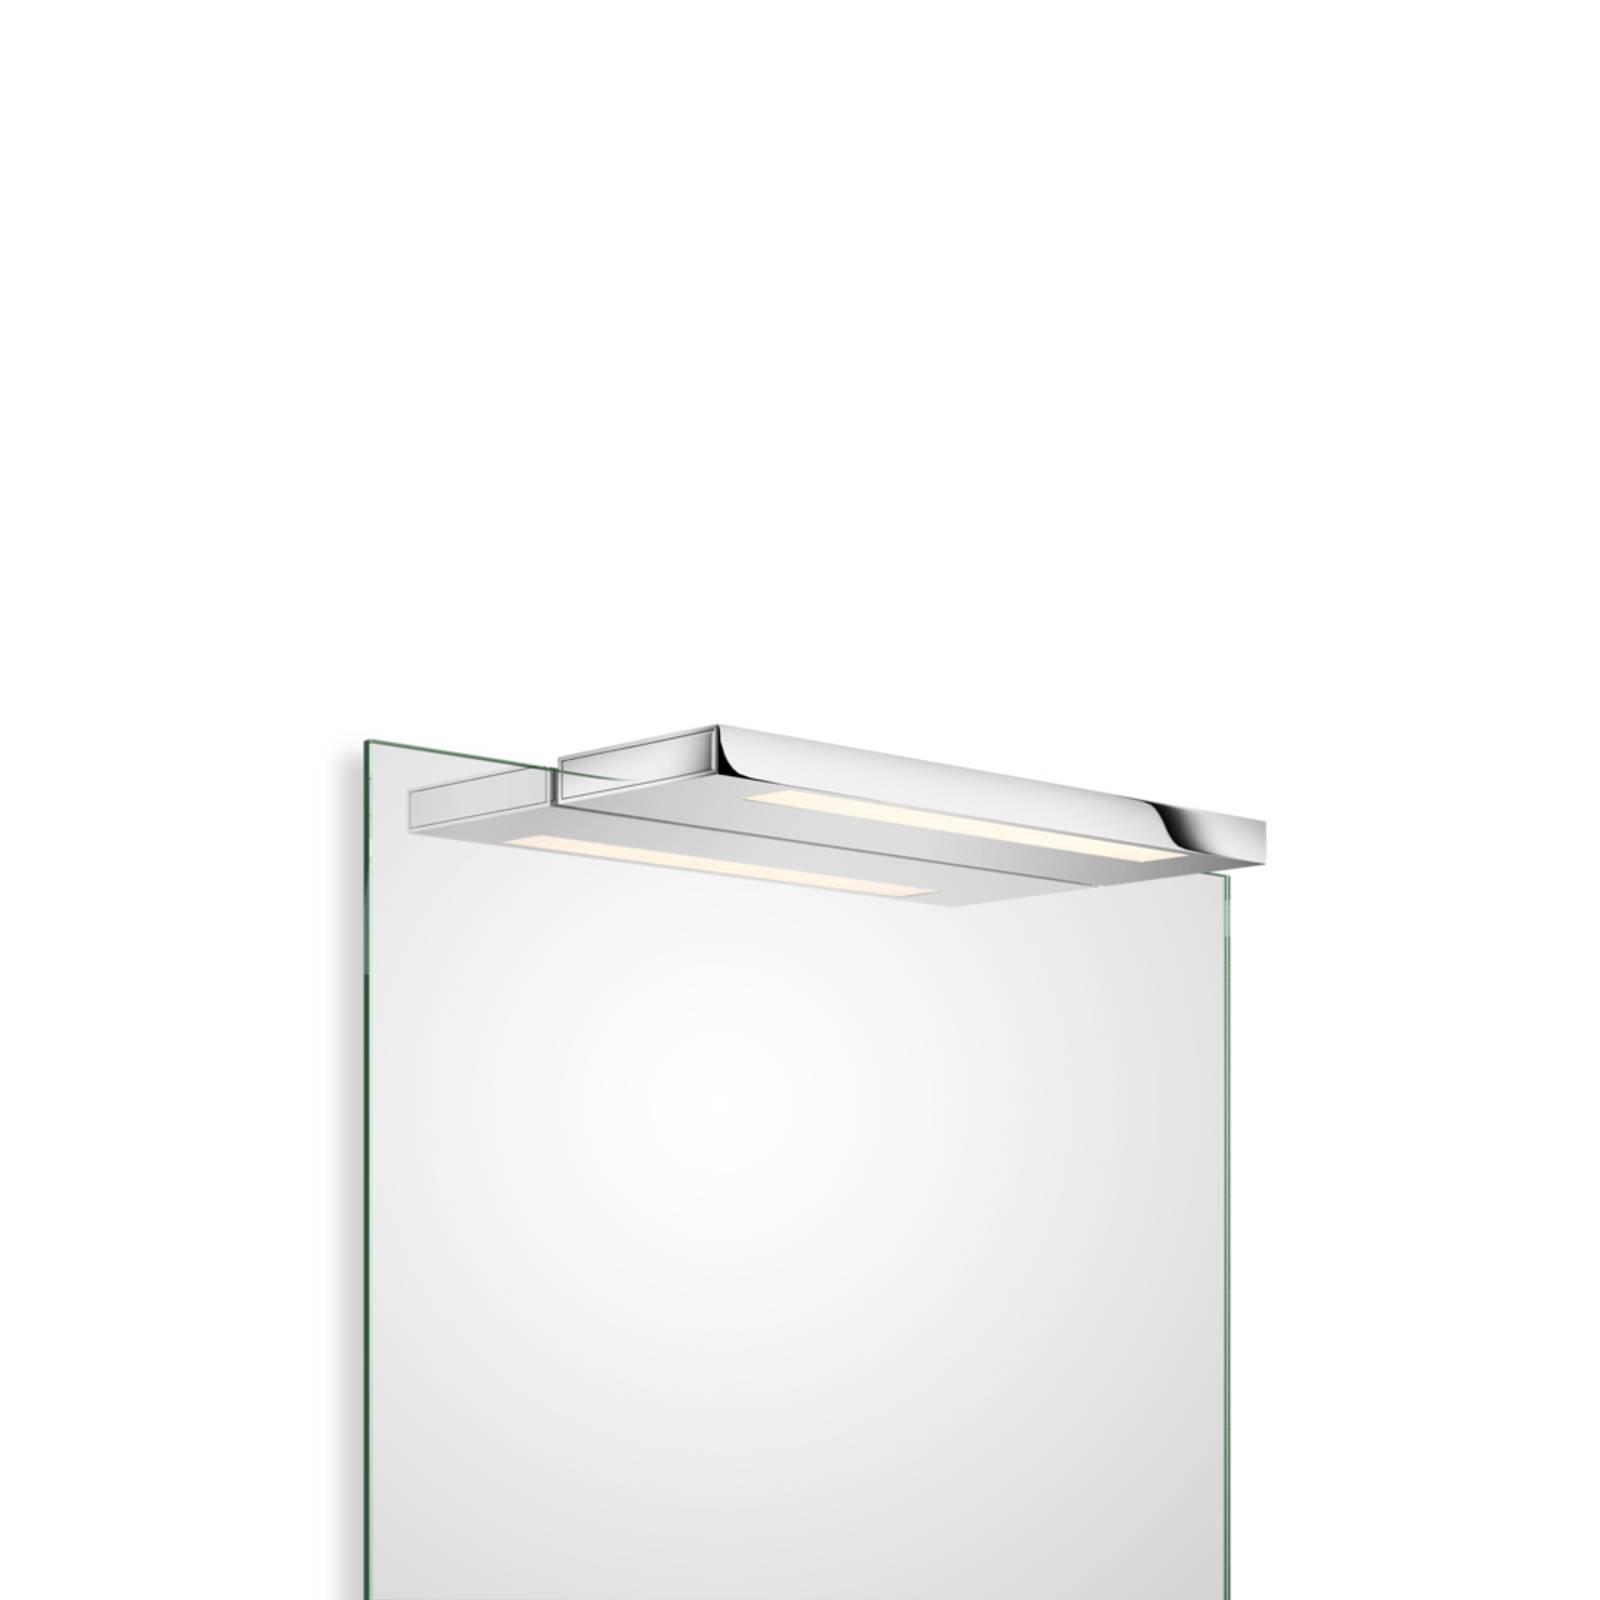 Decor Walther Slim LED-speillampe krom 34 cm